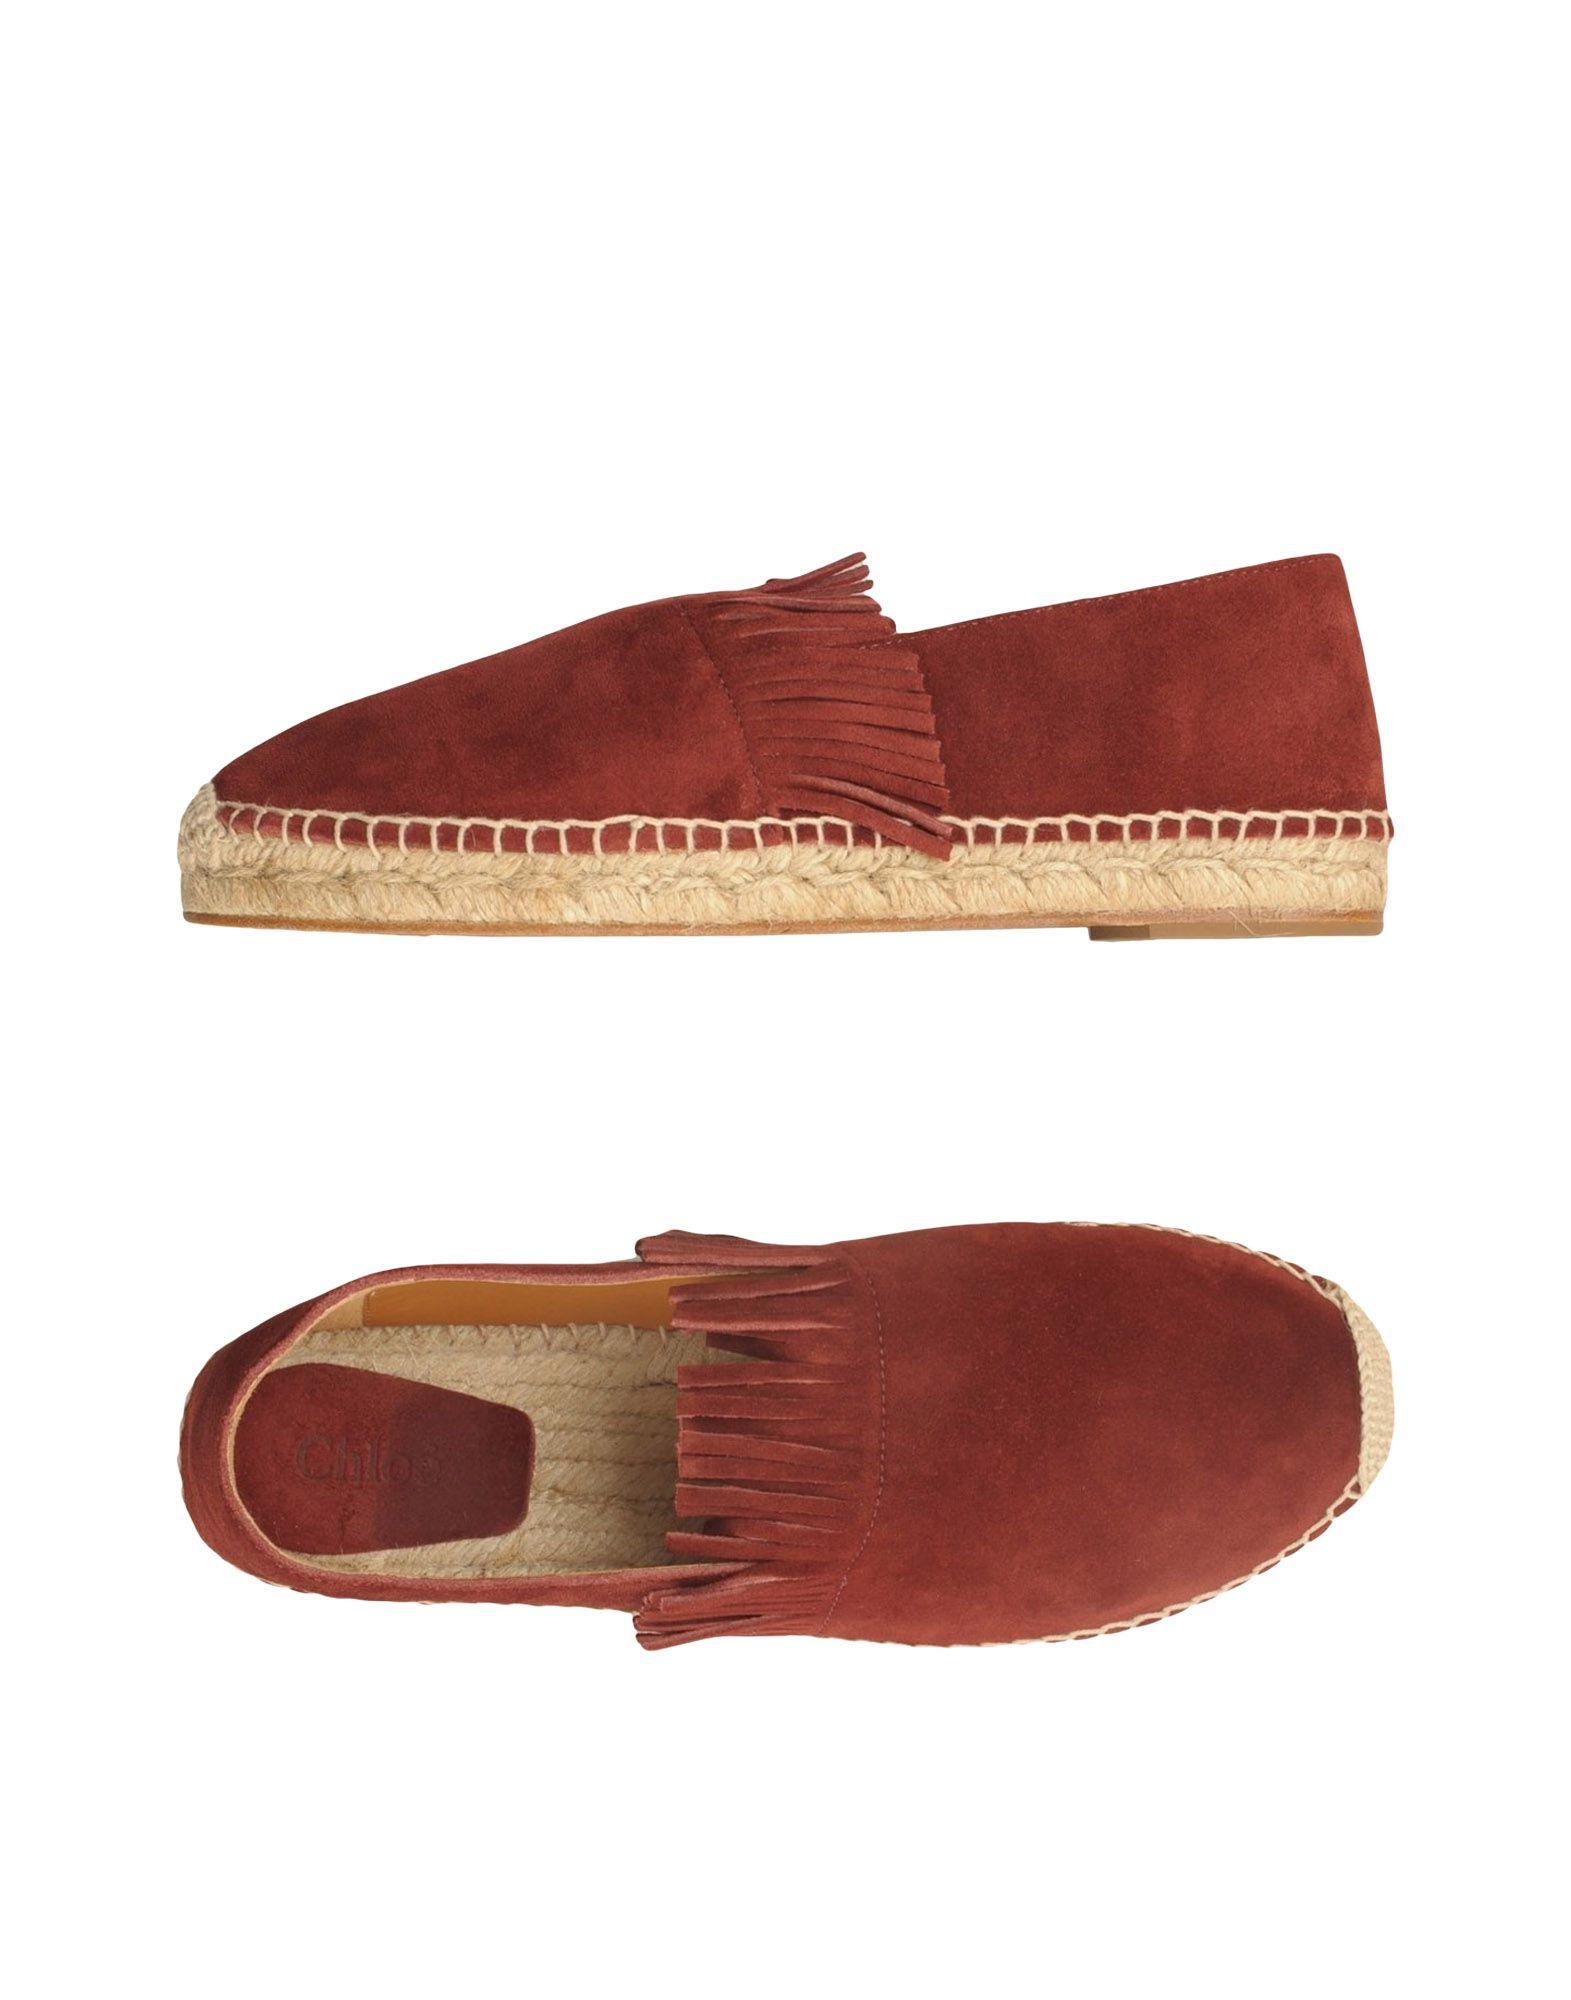 Chloé Espadrilles Damen Damen Espadrilles  11107426KE Heiße Schuhe 389ce0